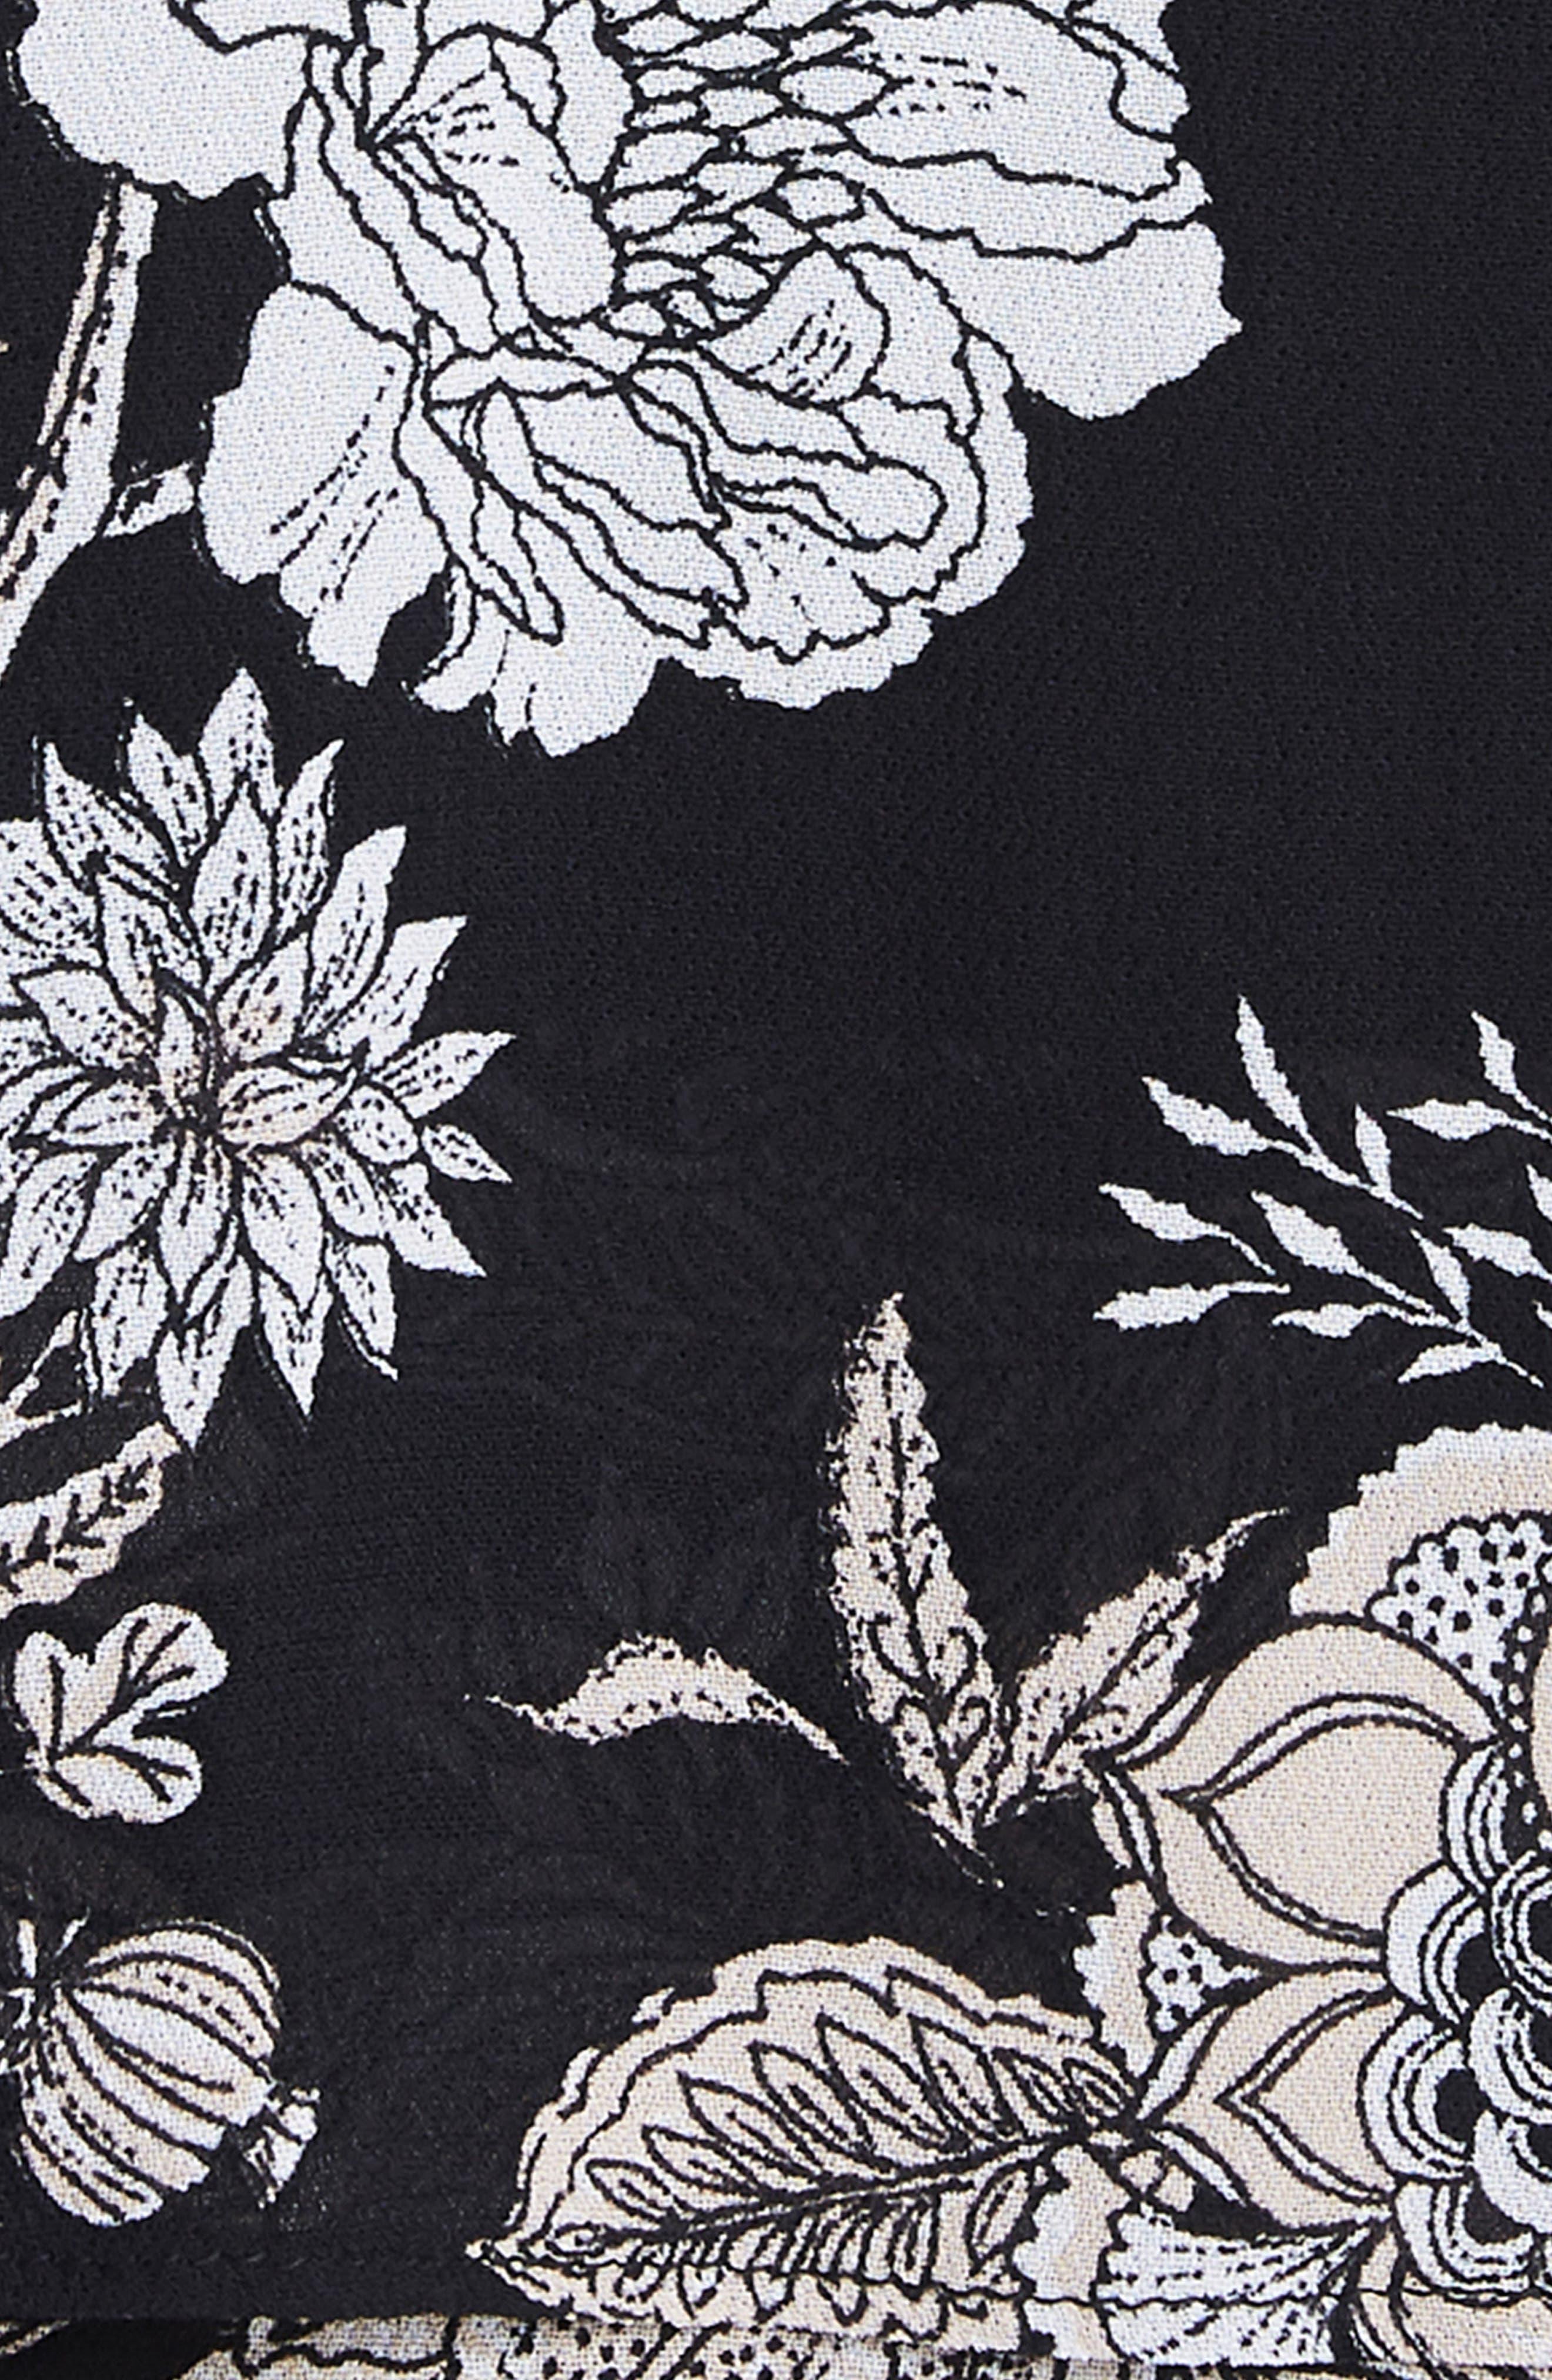 Amabella Tiered Maxi Dress,                             Alternate thumbnail 4, color,                             001